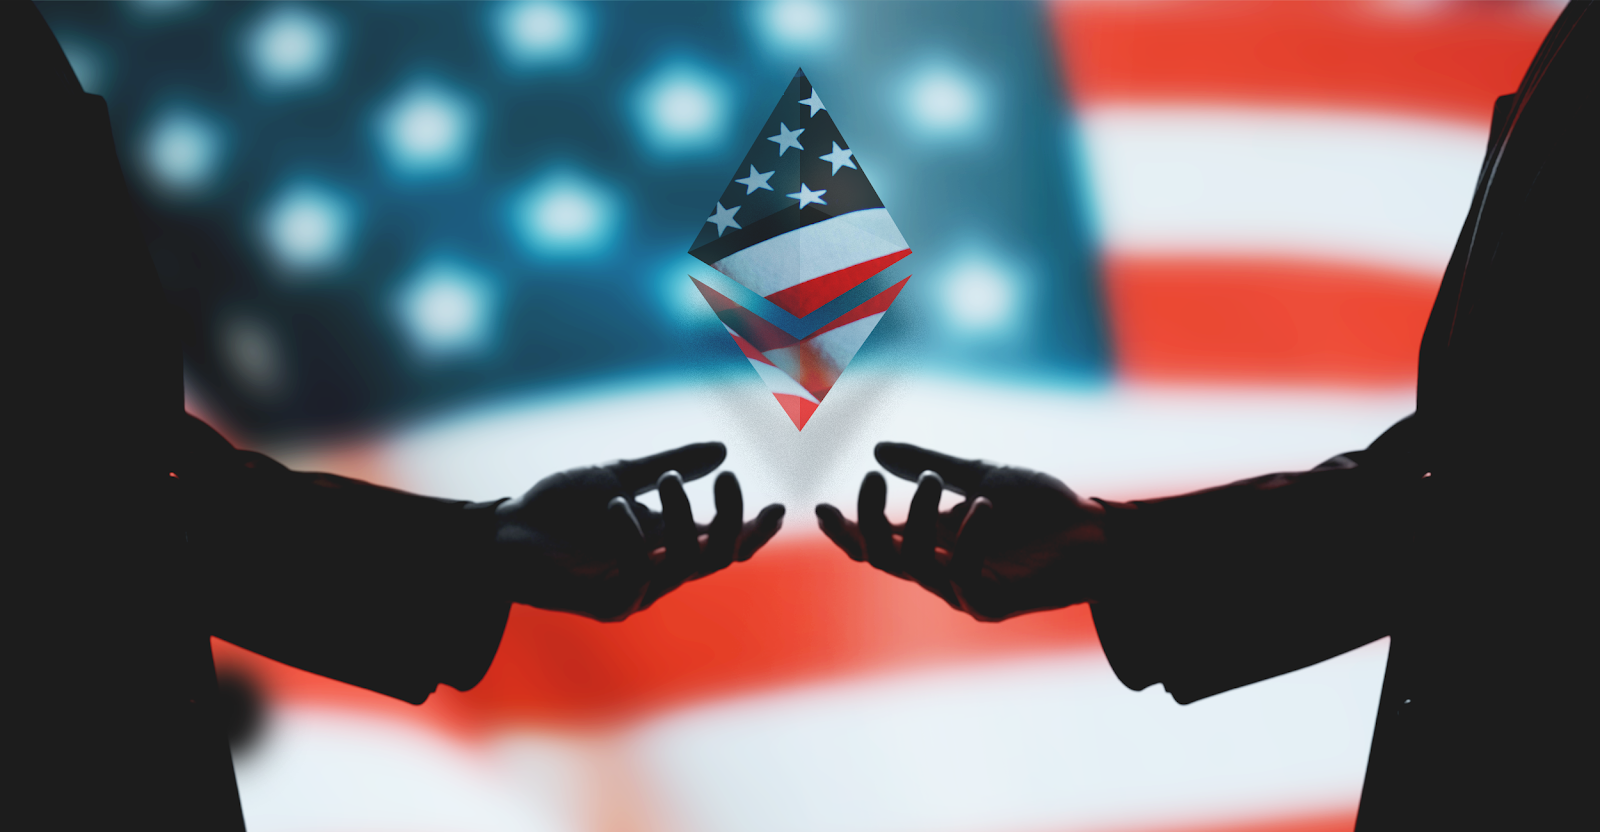 US Congress urged to ease regulatory burden on some blockchain firms